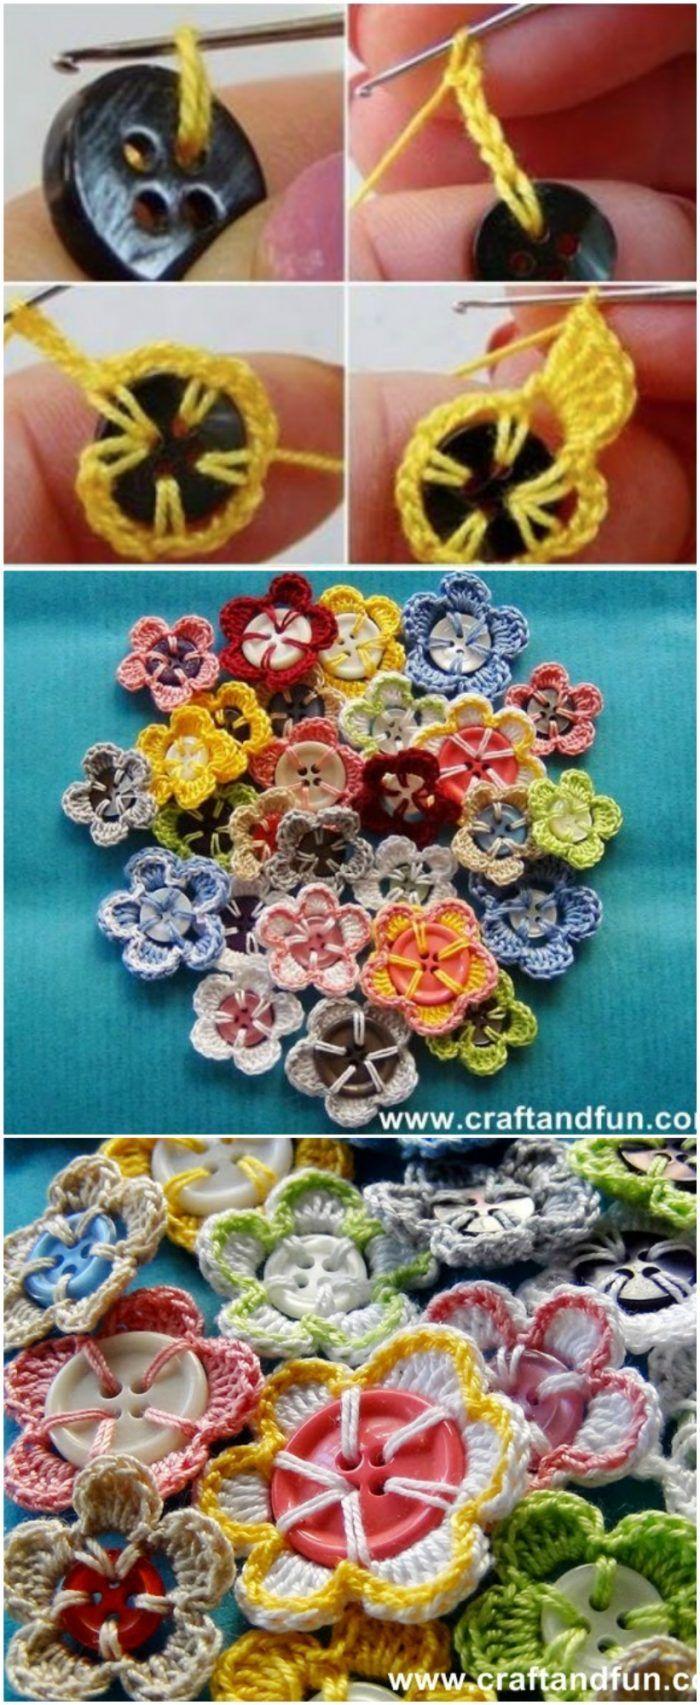 Crochet Button Flowers Video Free Pattern Lots Of Ideas – Crochet and Knitting Patterns